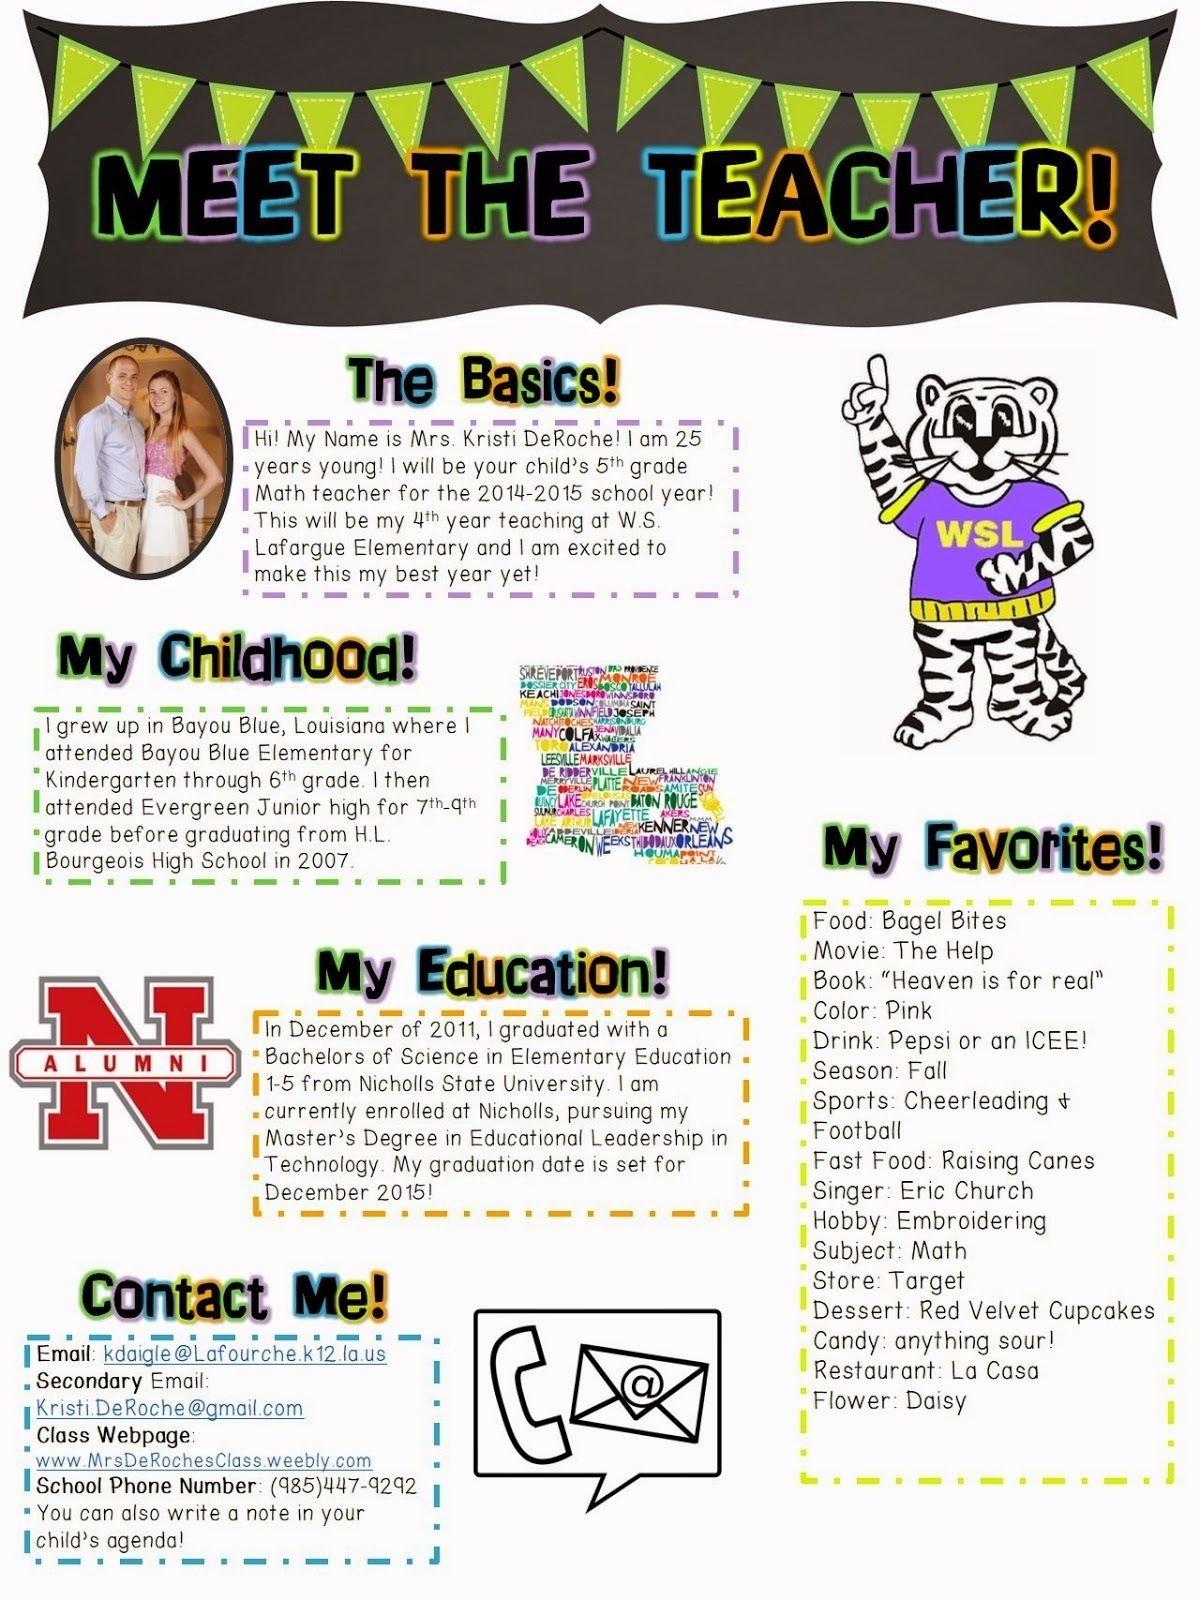 10 Lovely Middle School Open House Ideas meet the teacher open house newsletter school ideas pinterest 1 2020